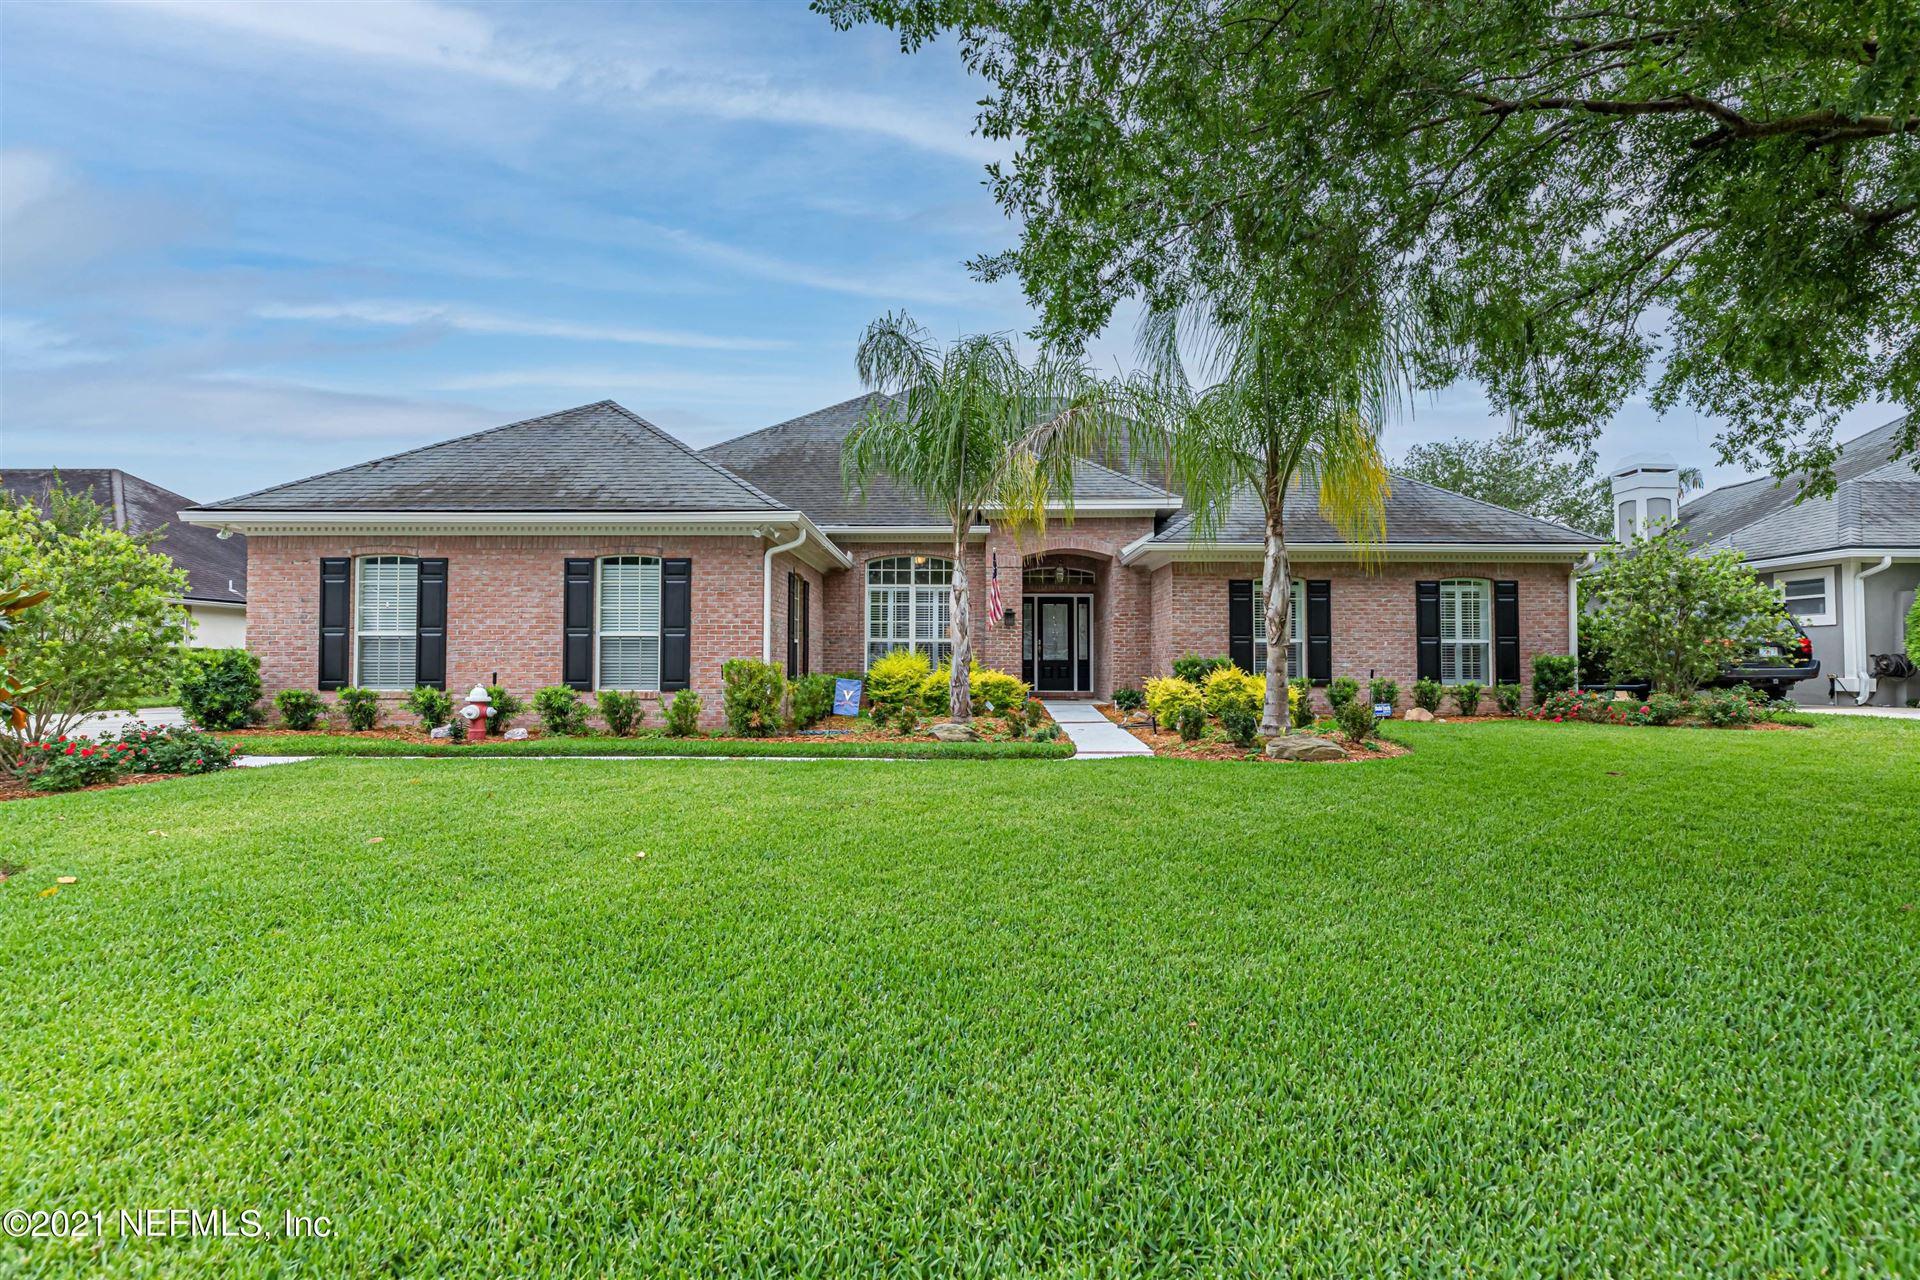 3764 REEDPOND DR N, Jacksonville, FL 32223 - MLS#: 1107101